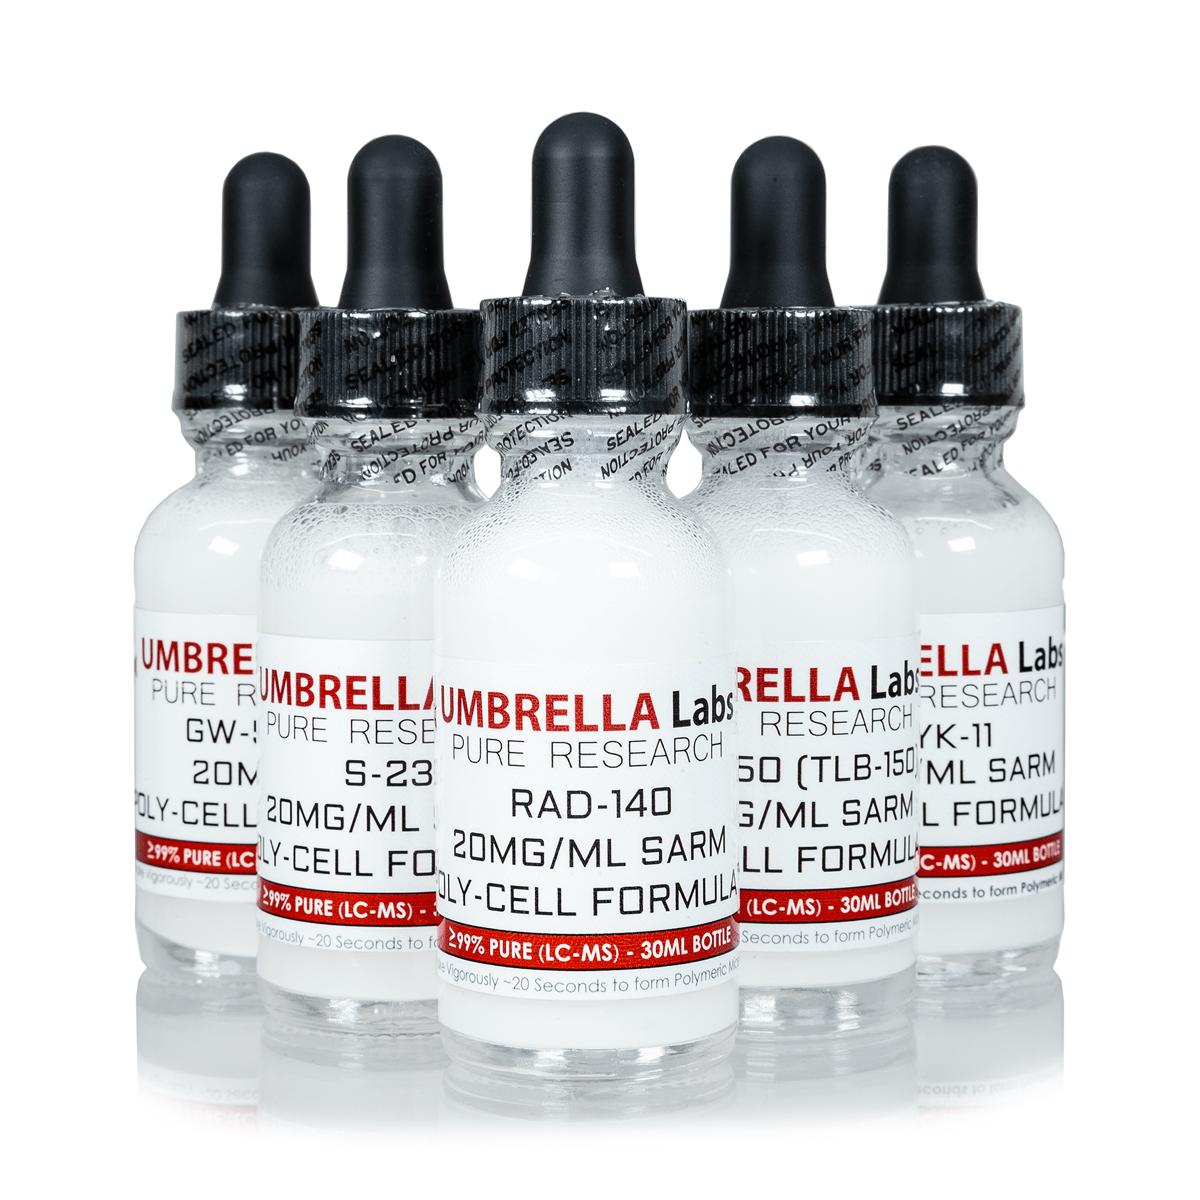 SARMs Liquid Buy SARMs From UMBRELLA Labs Quality SARMs For Sale